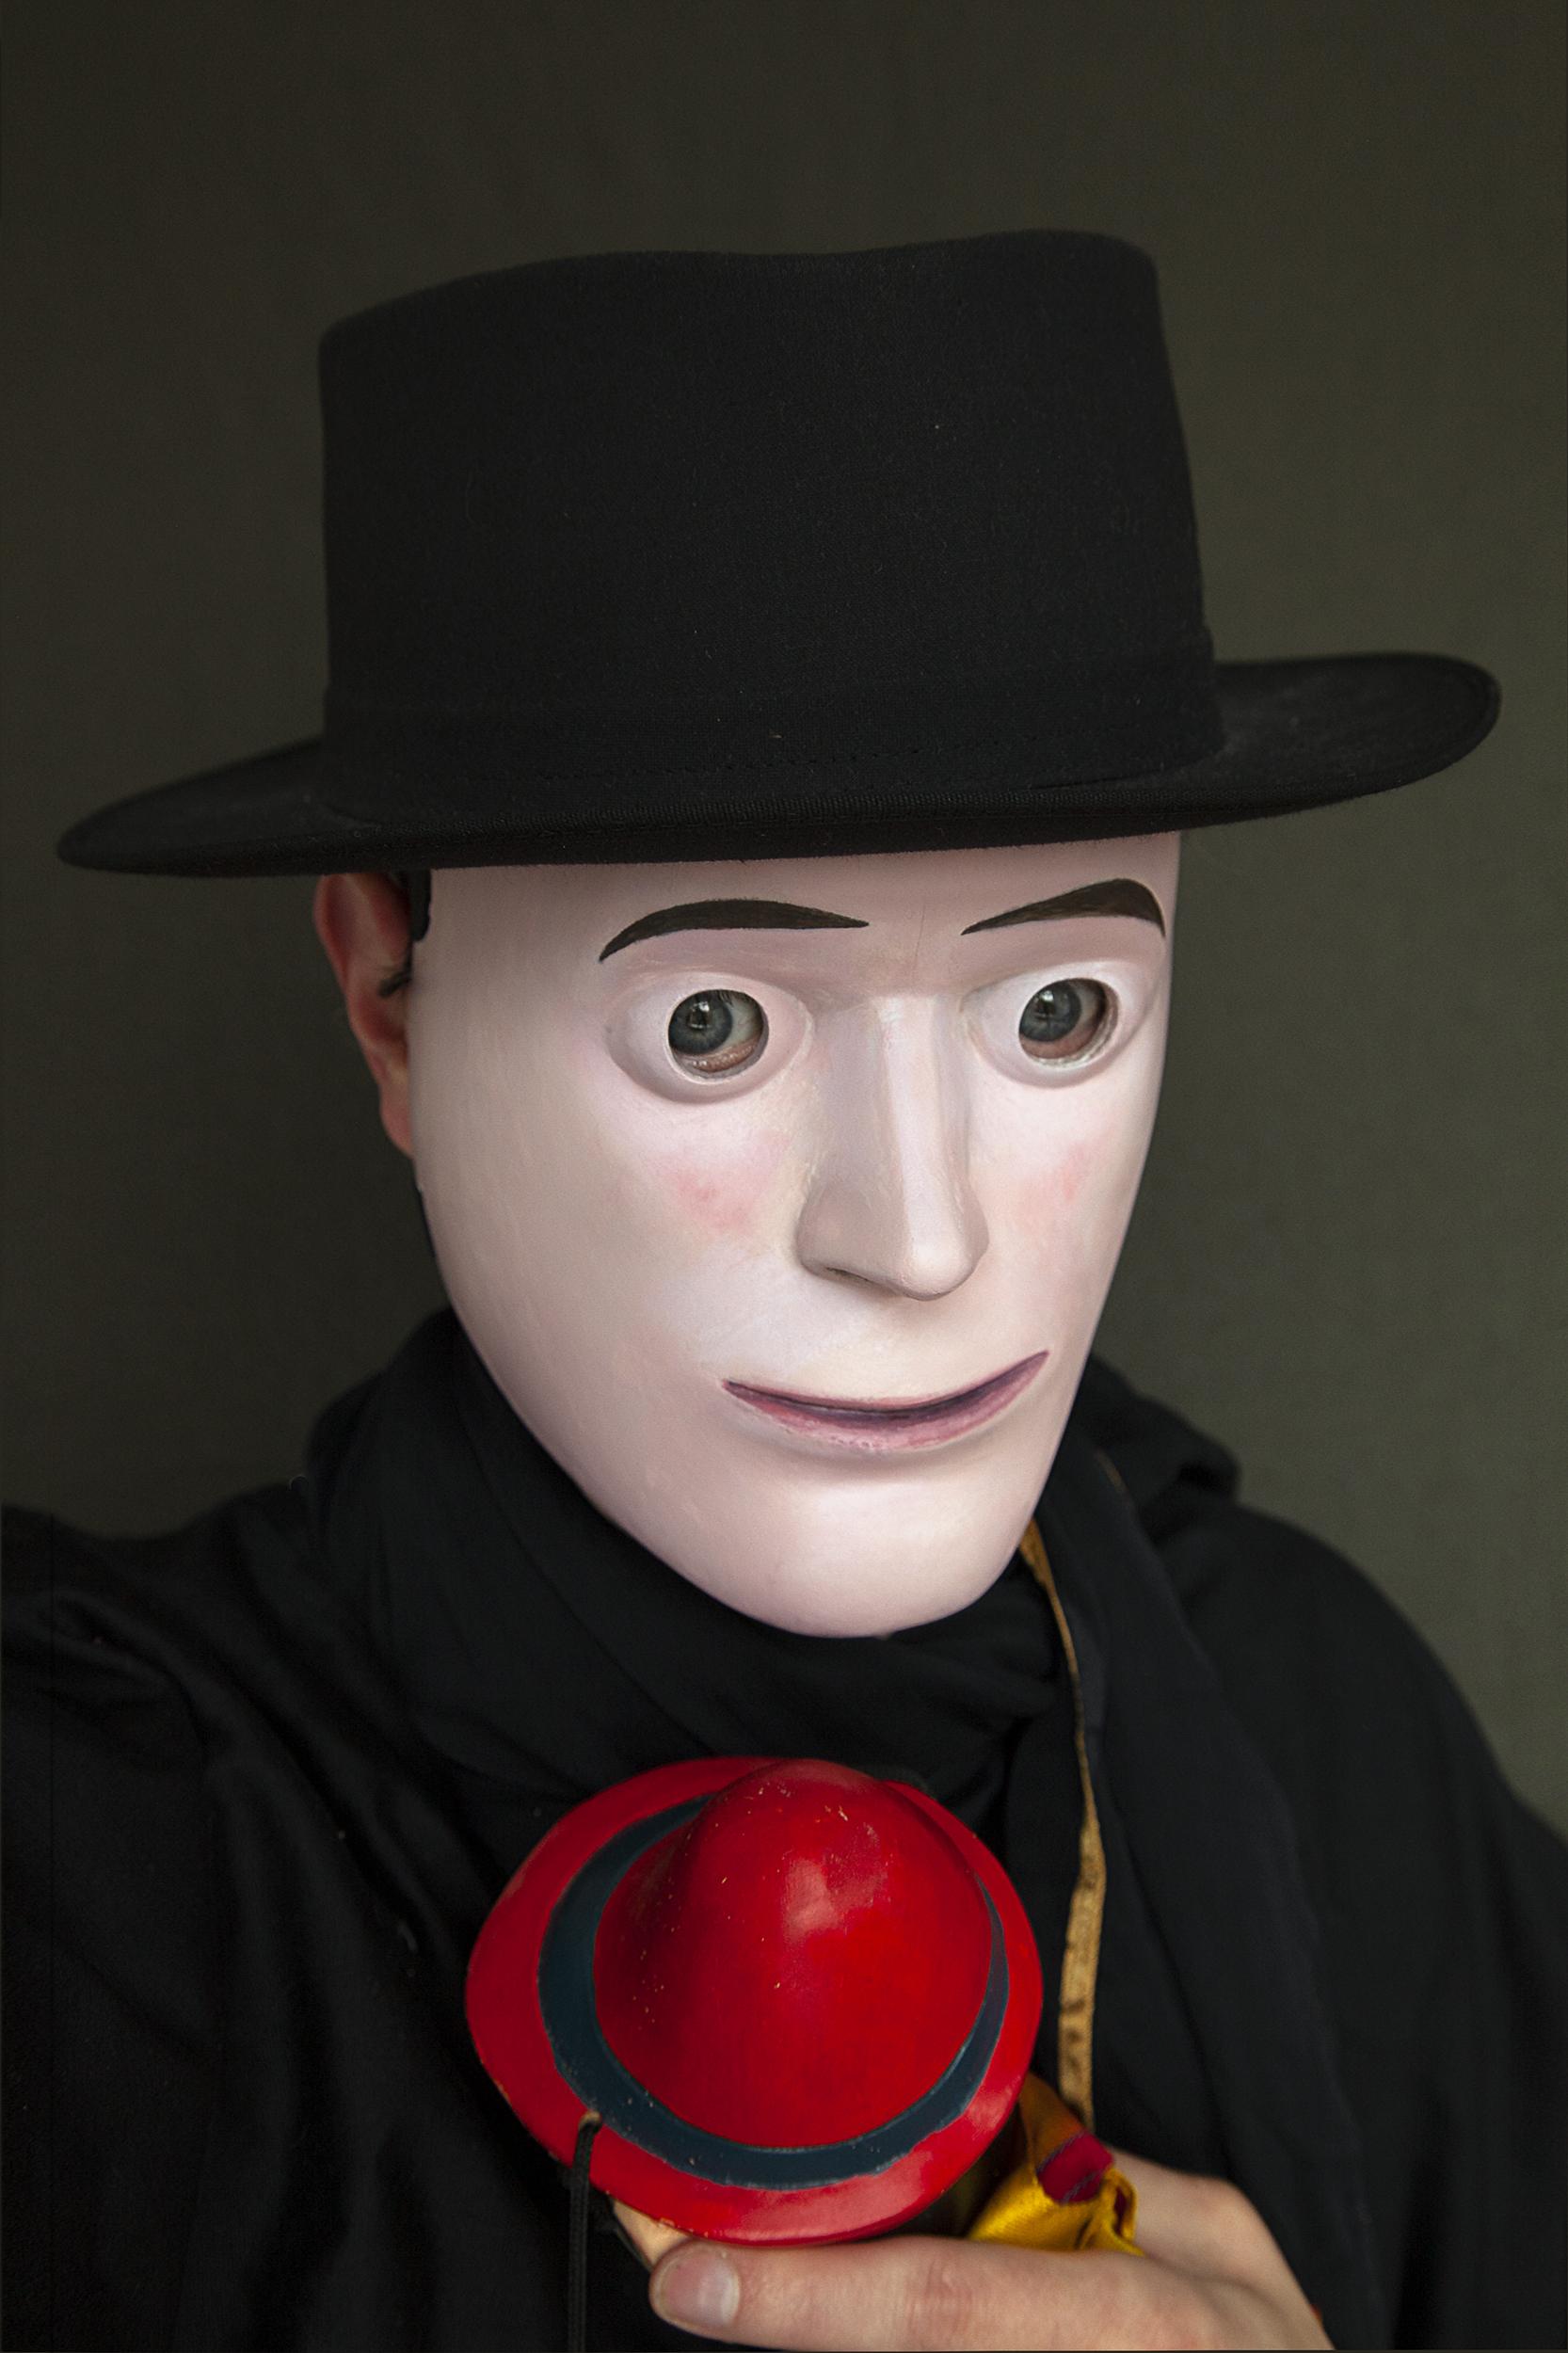 Pinocchio Self-portrait, photograph by Wouter van Riessen